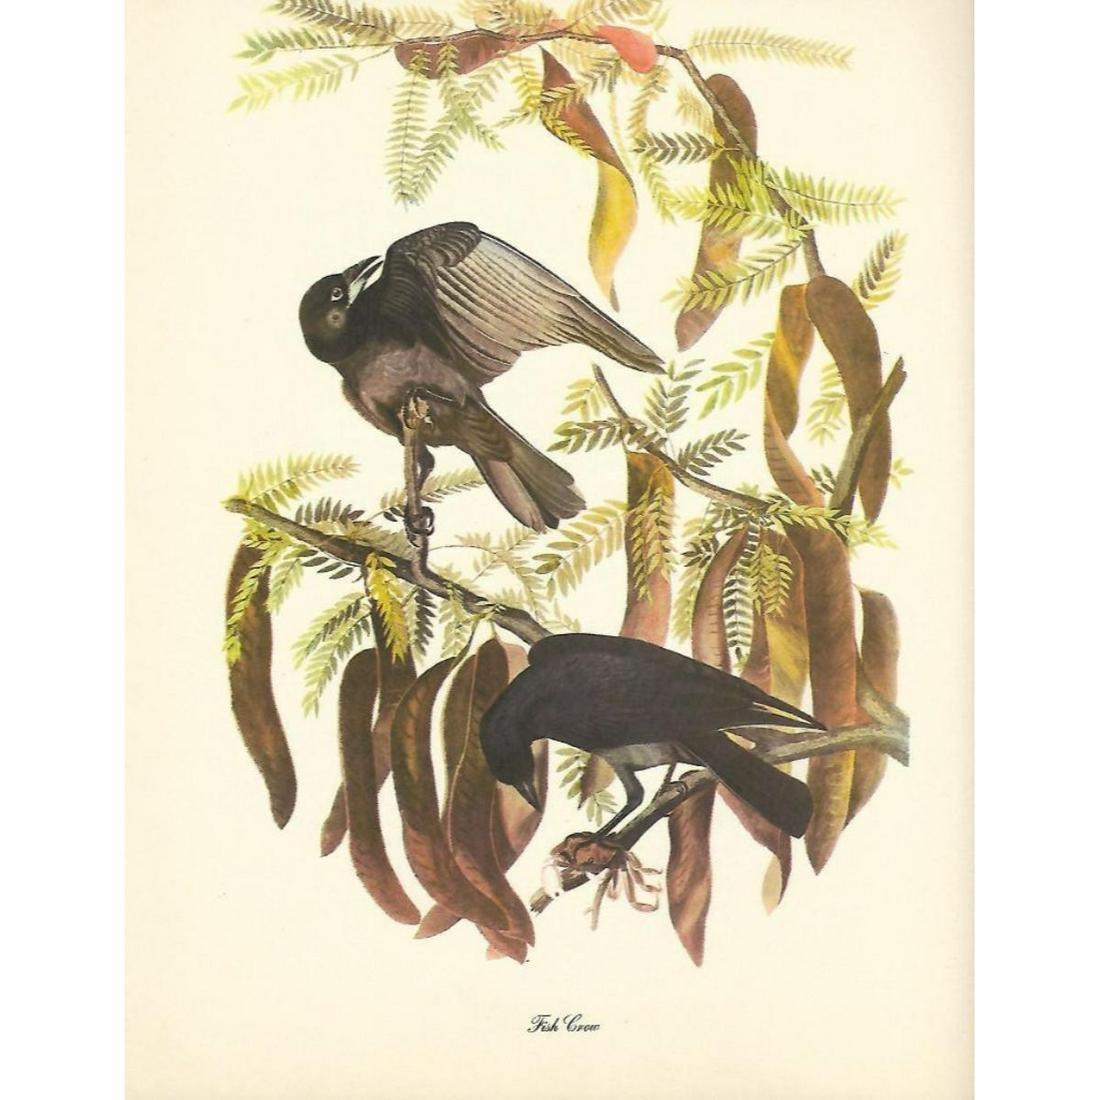 c1946 Audubon Print, Fish Crow c1946